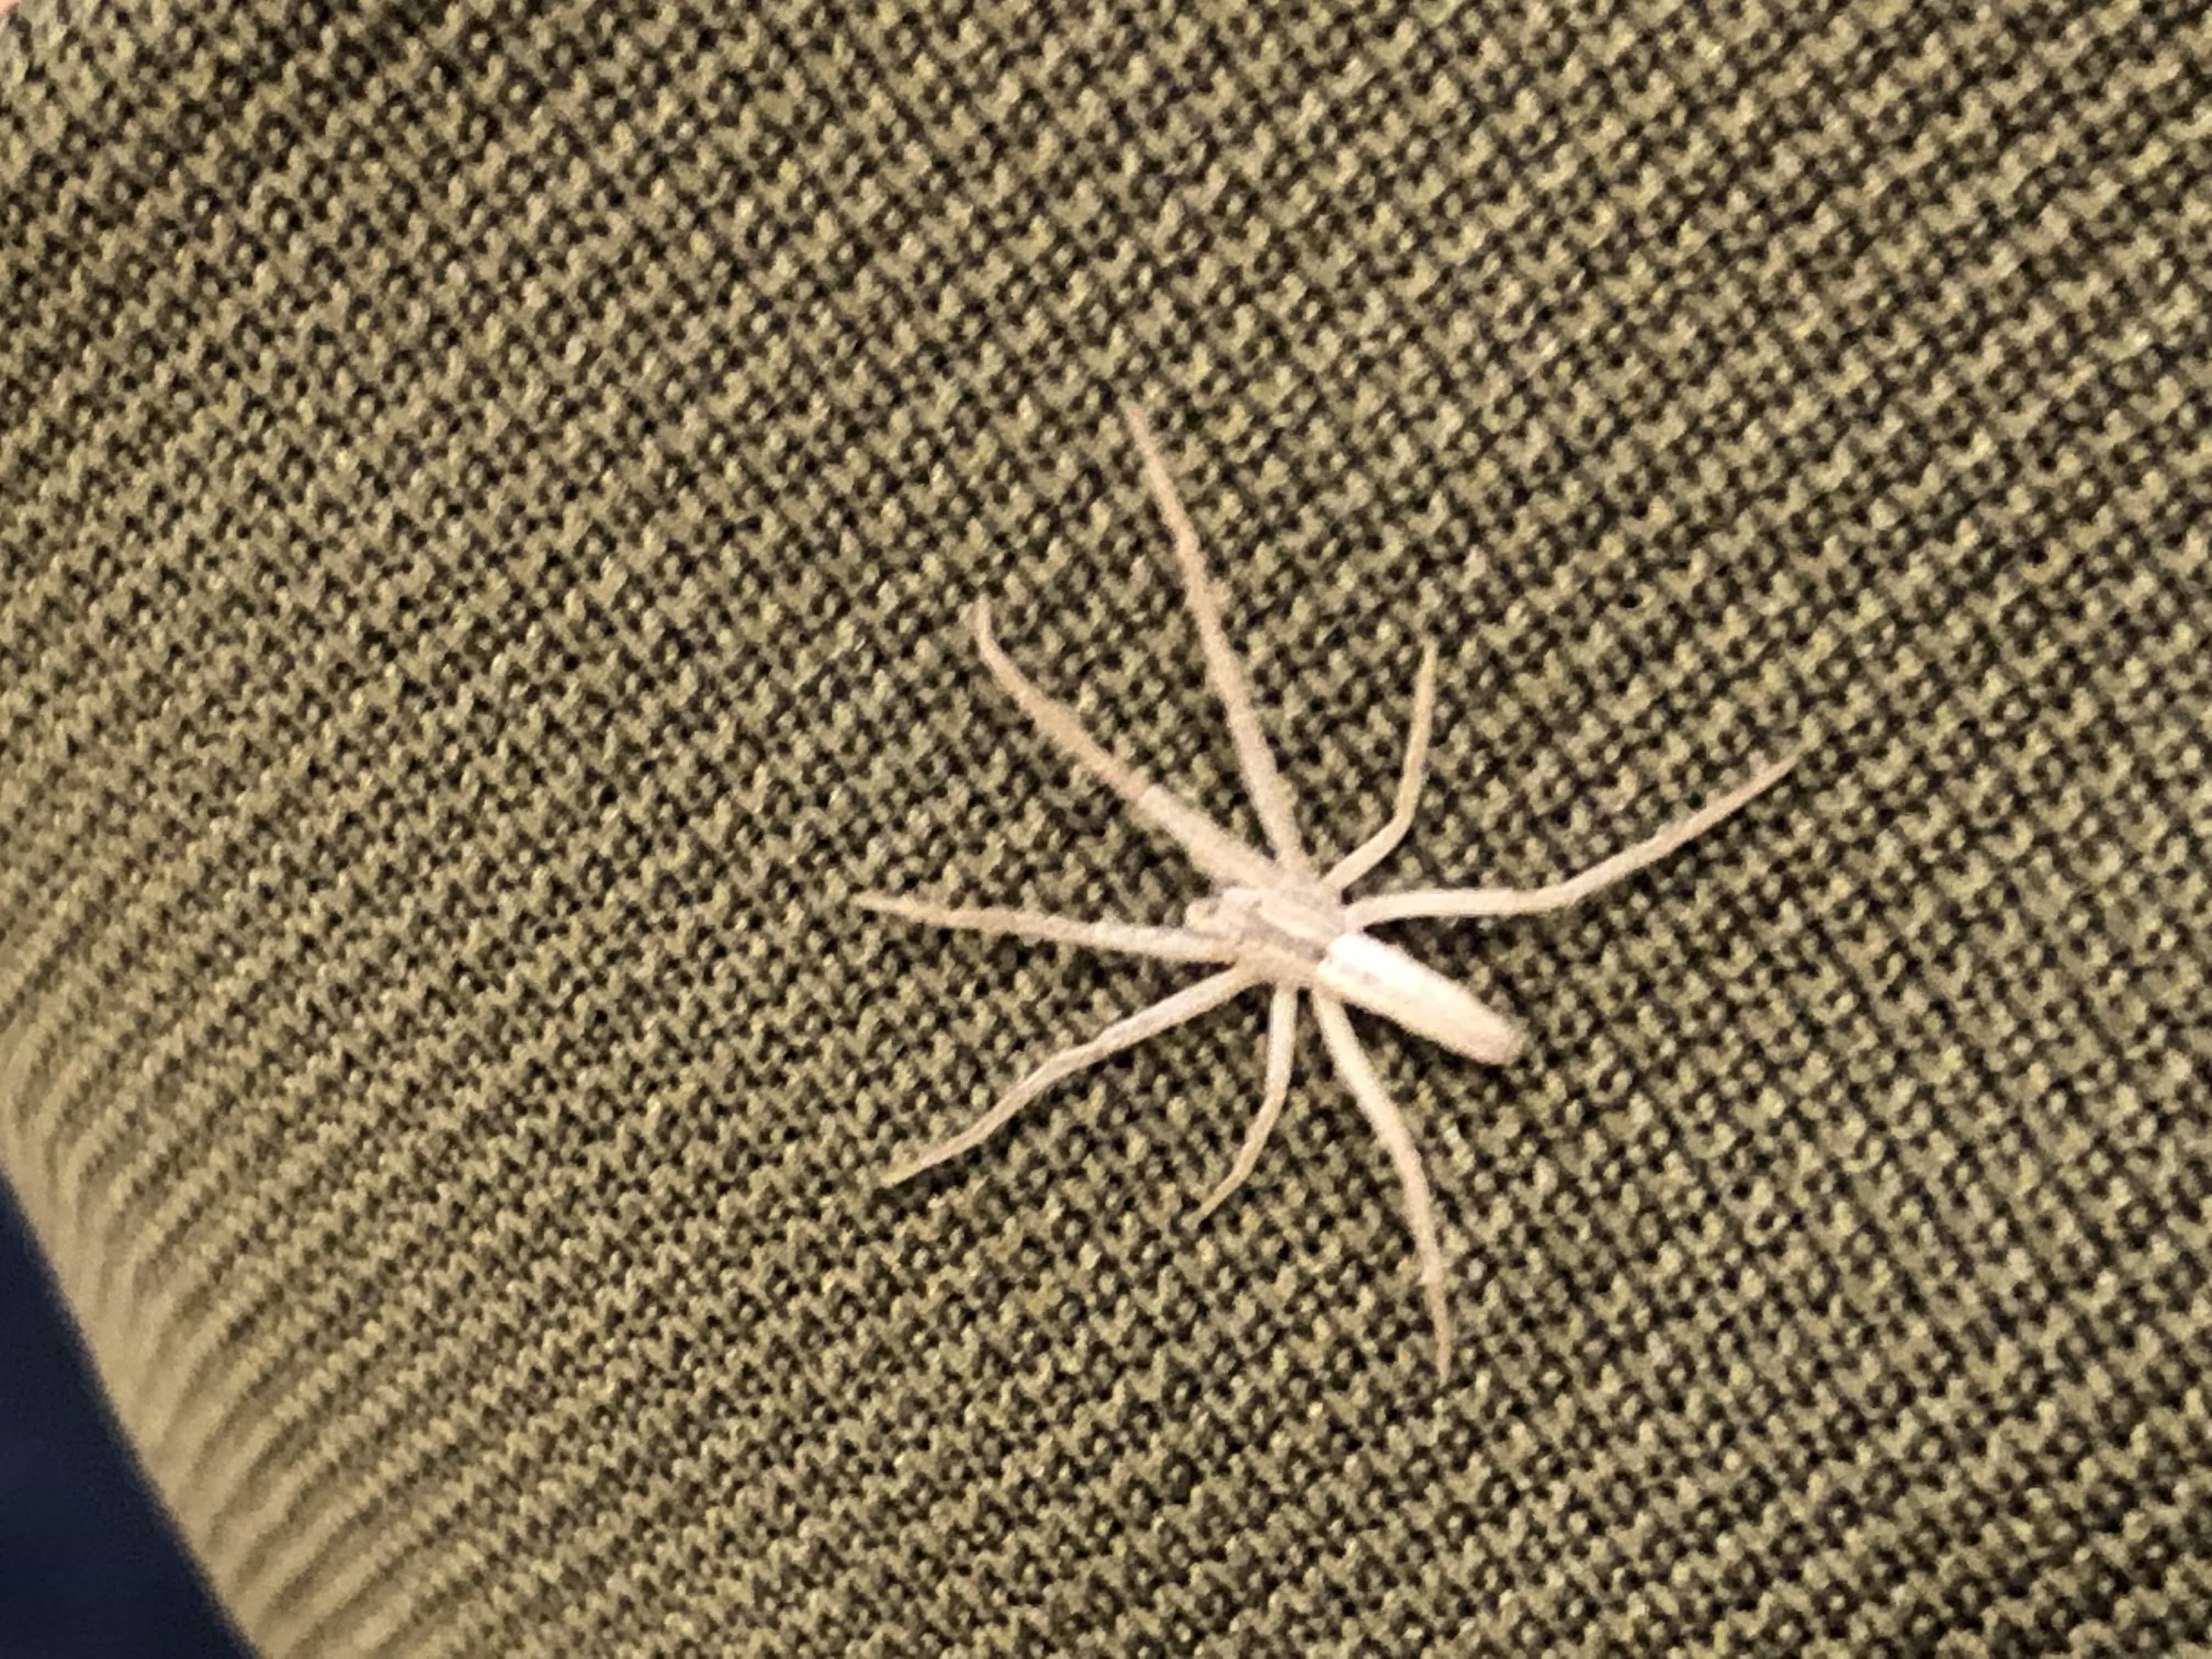 Picture of Tibellus (Slender Crab Spiders) - Dorsal